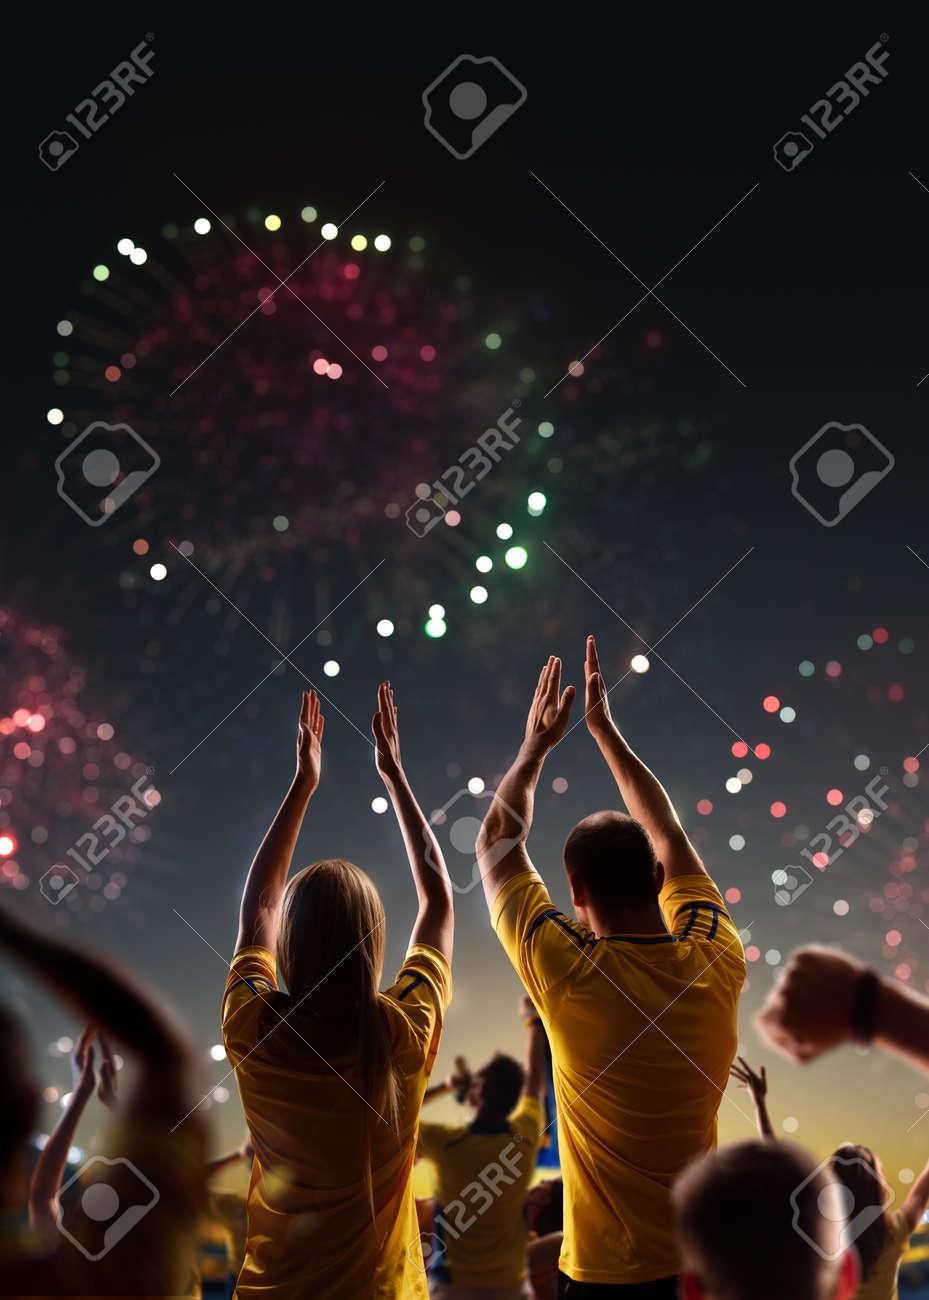 Fans celebrate in Stadium Arena night fireworks - 157252528